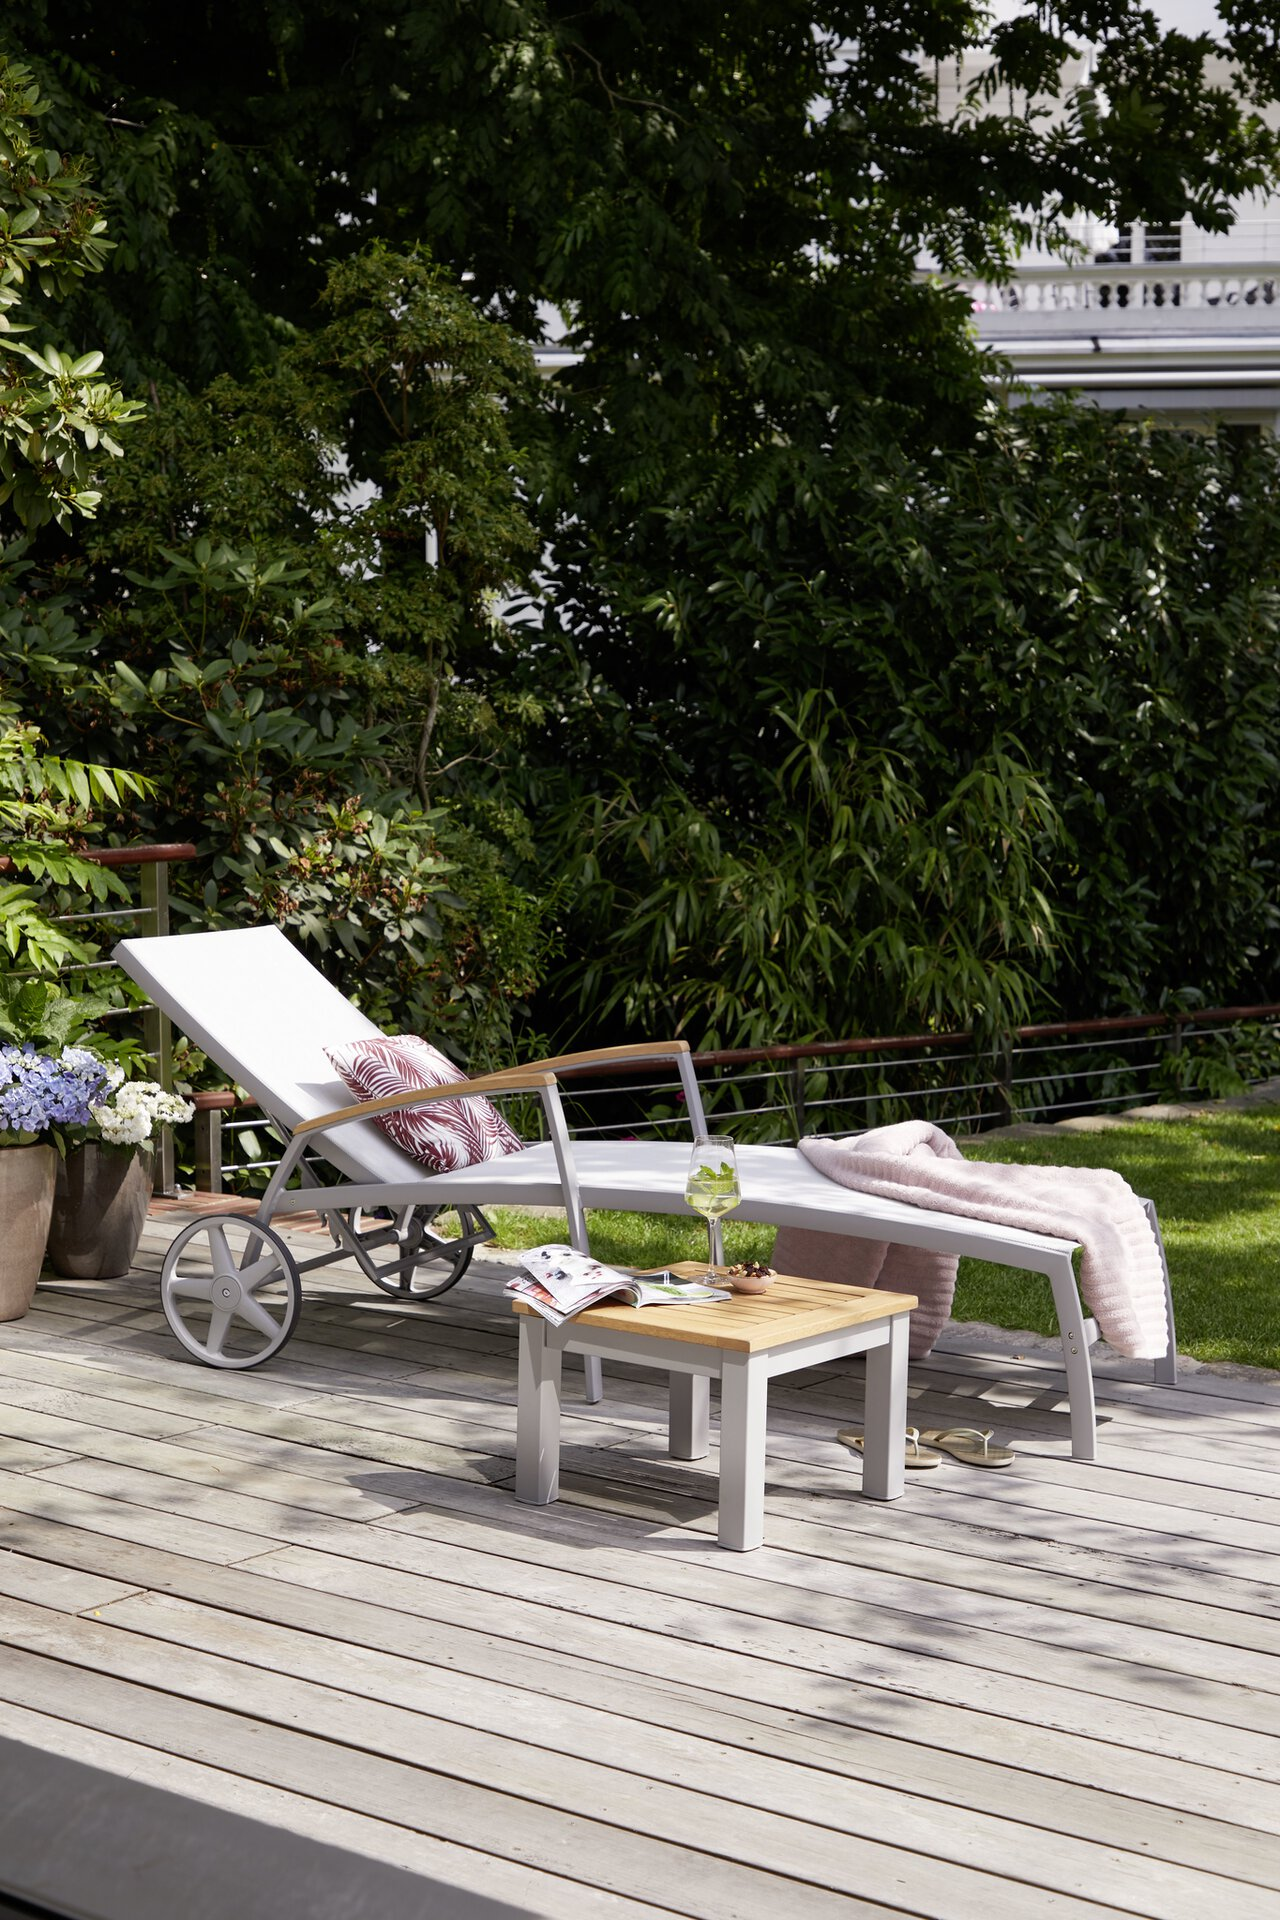 Liege SYLT Outdoor Textil 103 x 78 x 180 cm